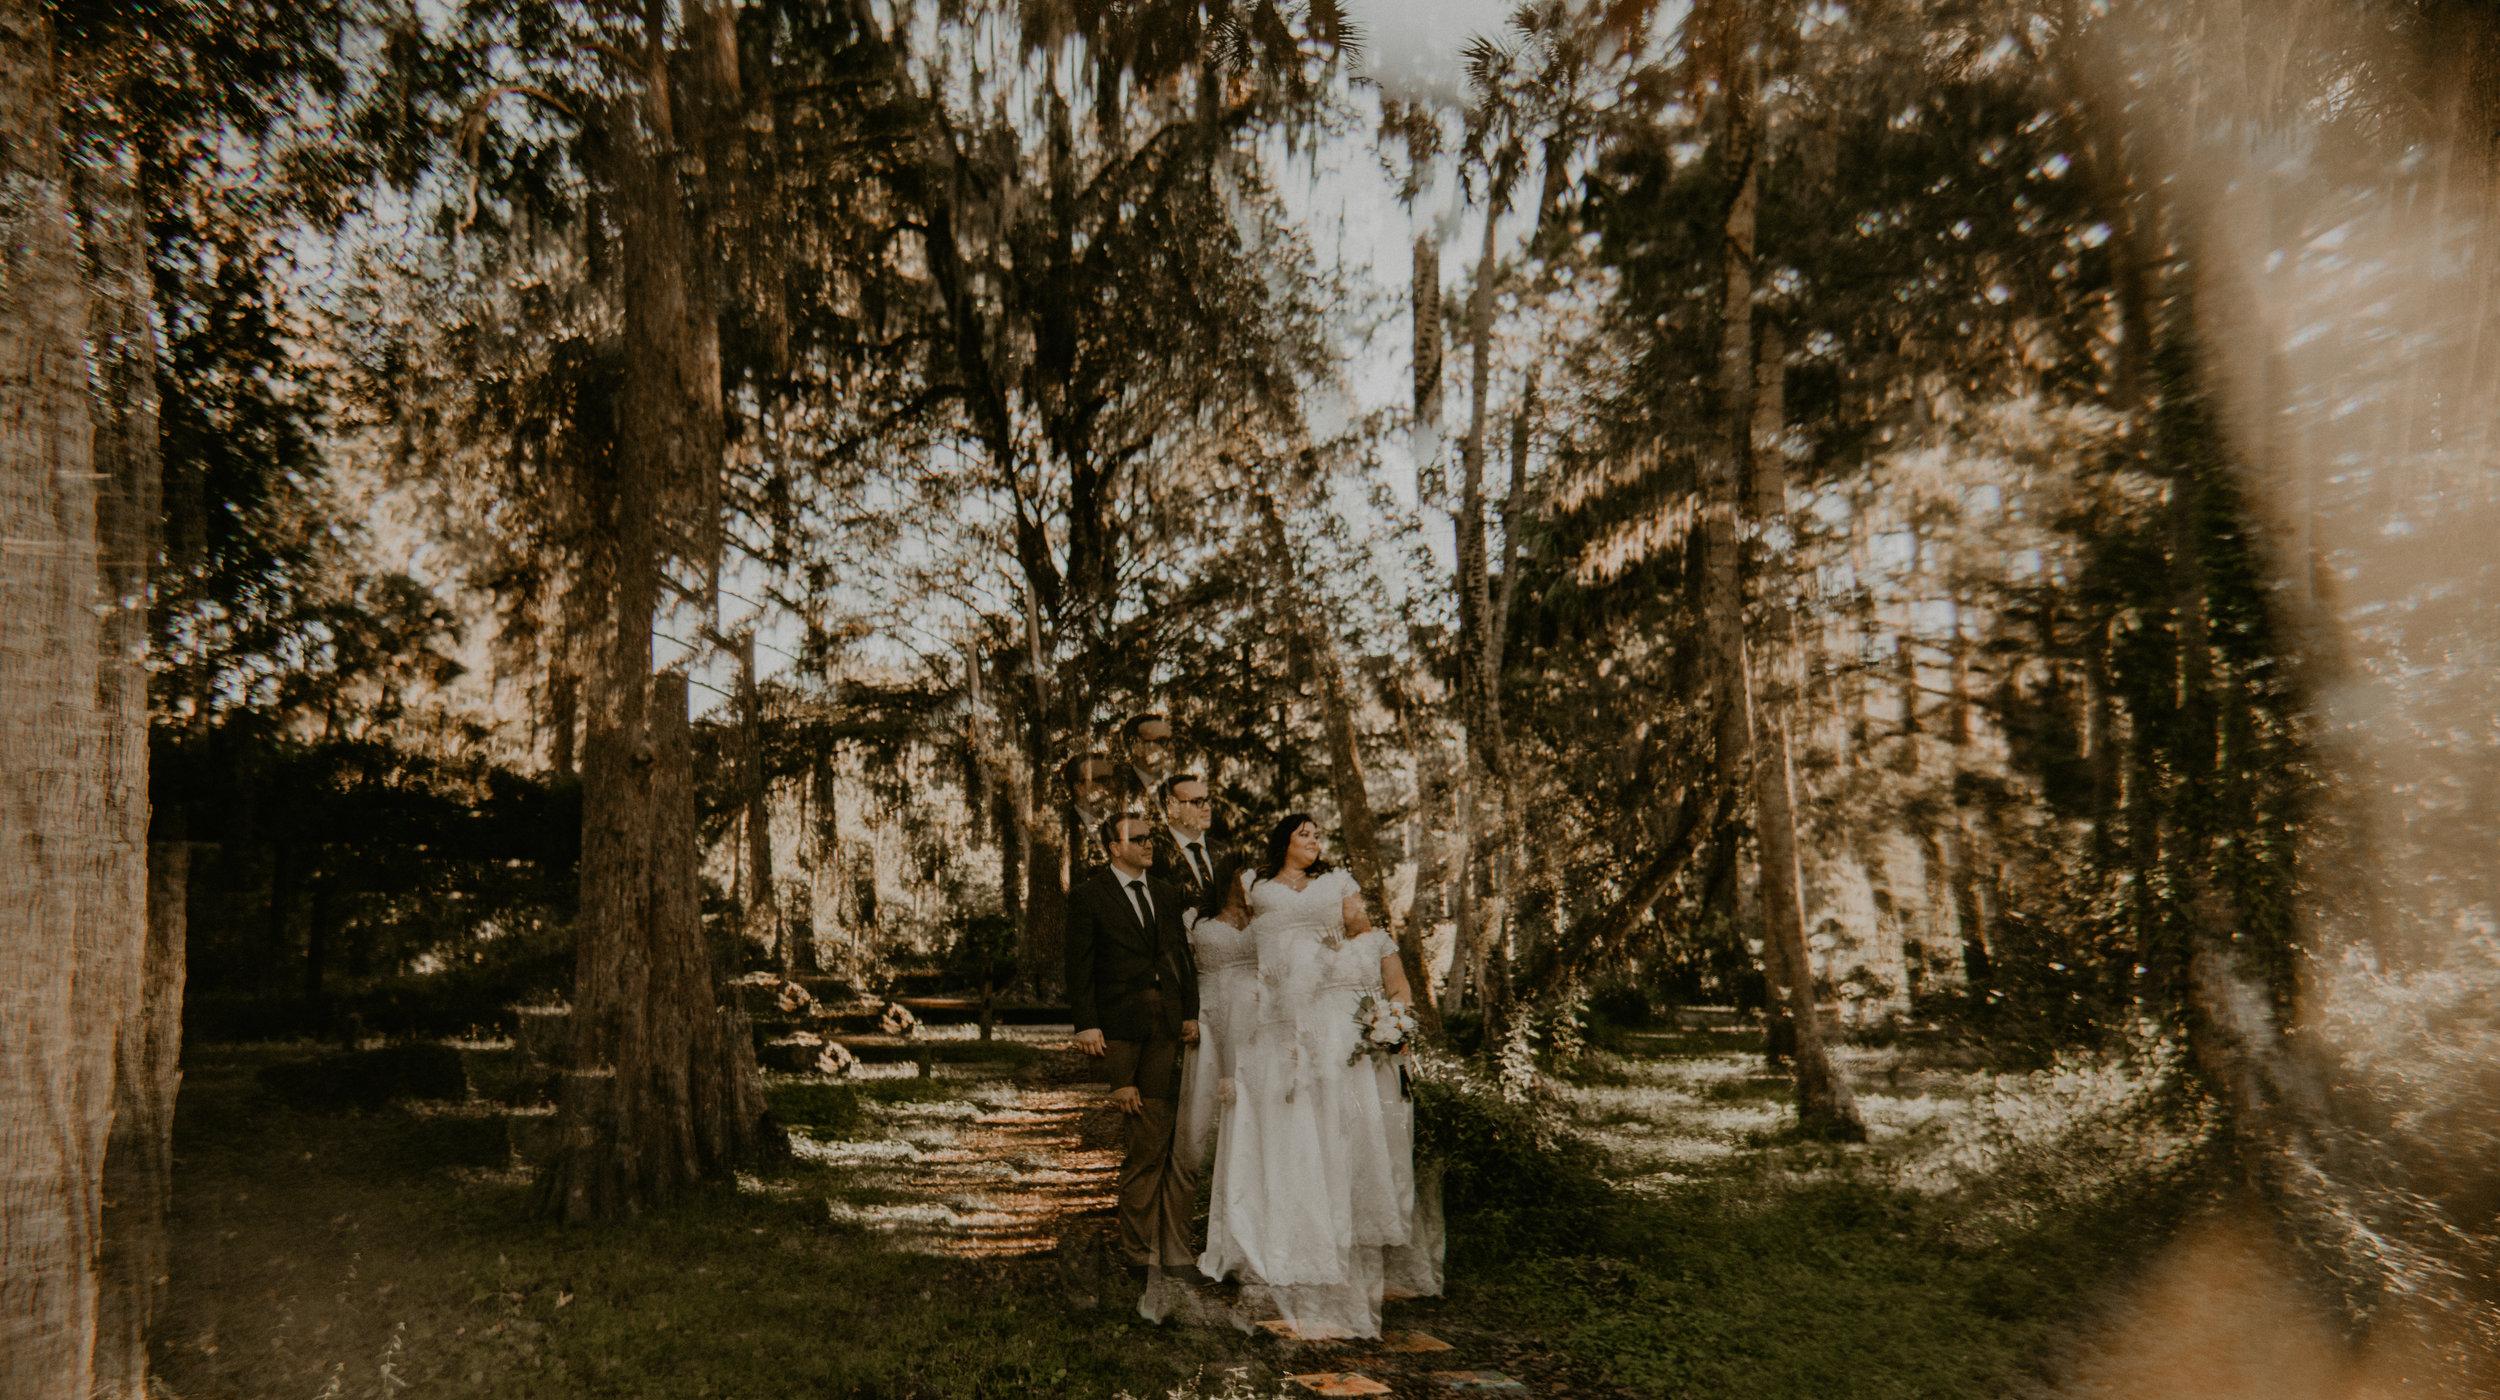 Silver Springs State Park Silver Springs Florida-Wedding-Kat and Tom35.JPG